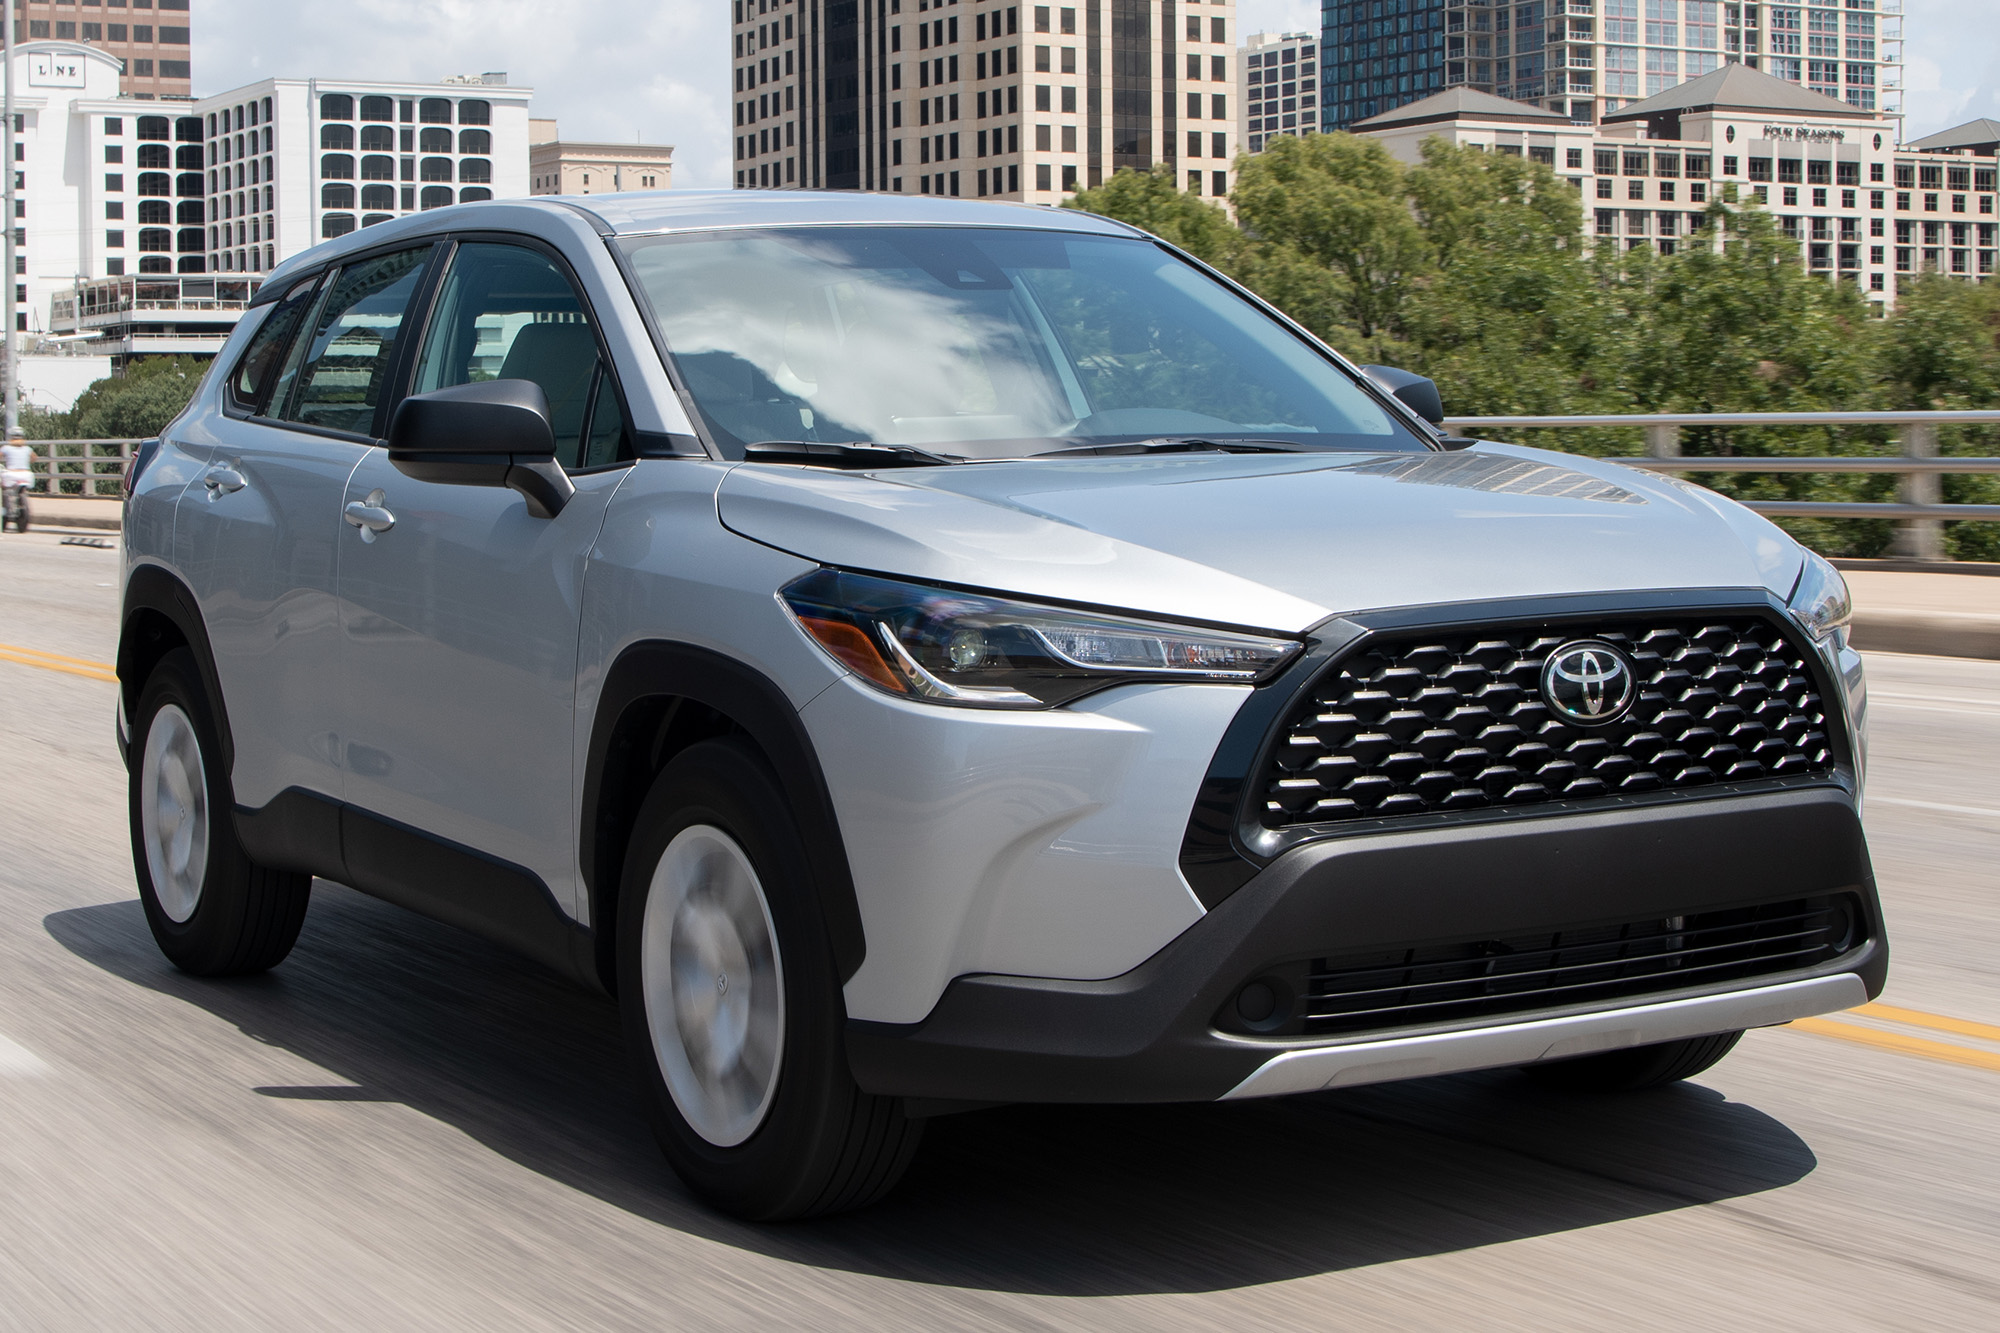 Toyota Corolla Cross 2022 cinza 3/4 de frente